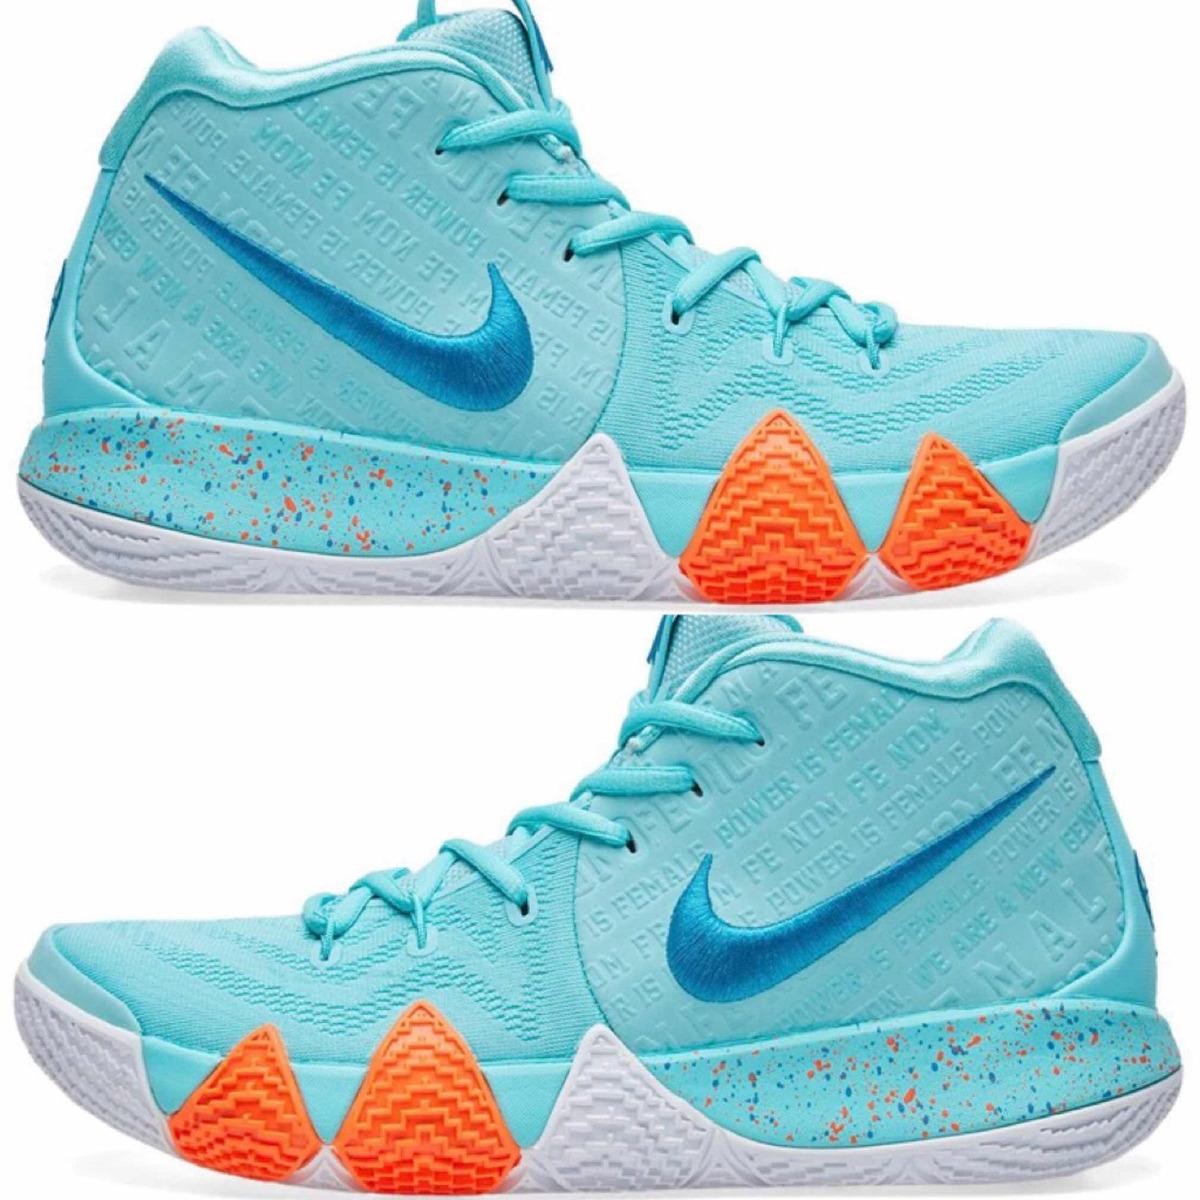 brand new 06143 f16cc Tenis Nike Kyrie 4 // Edicion Power Is Female // #28.5 Cm/